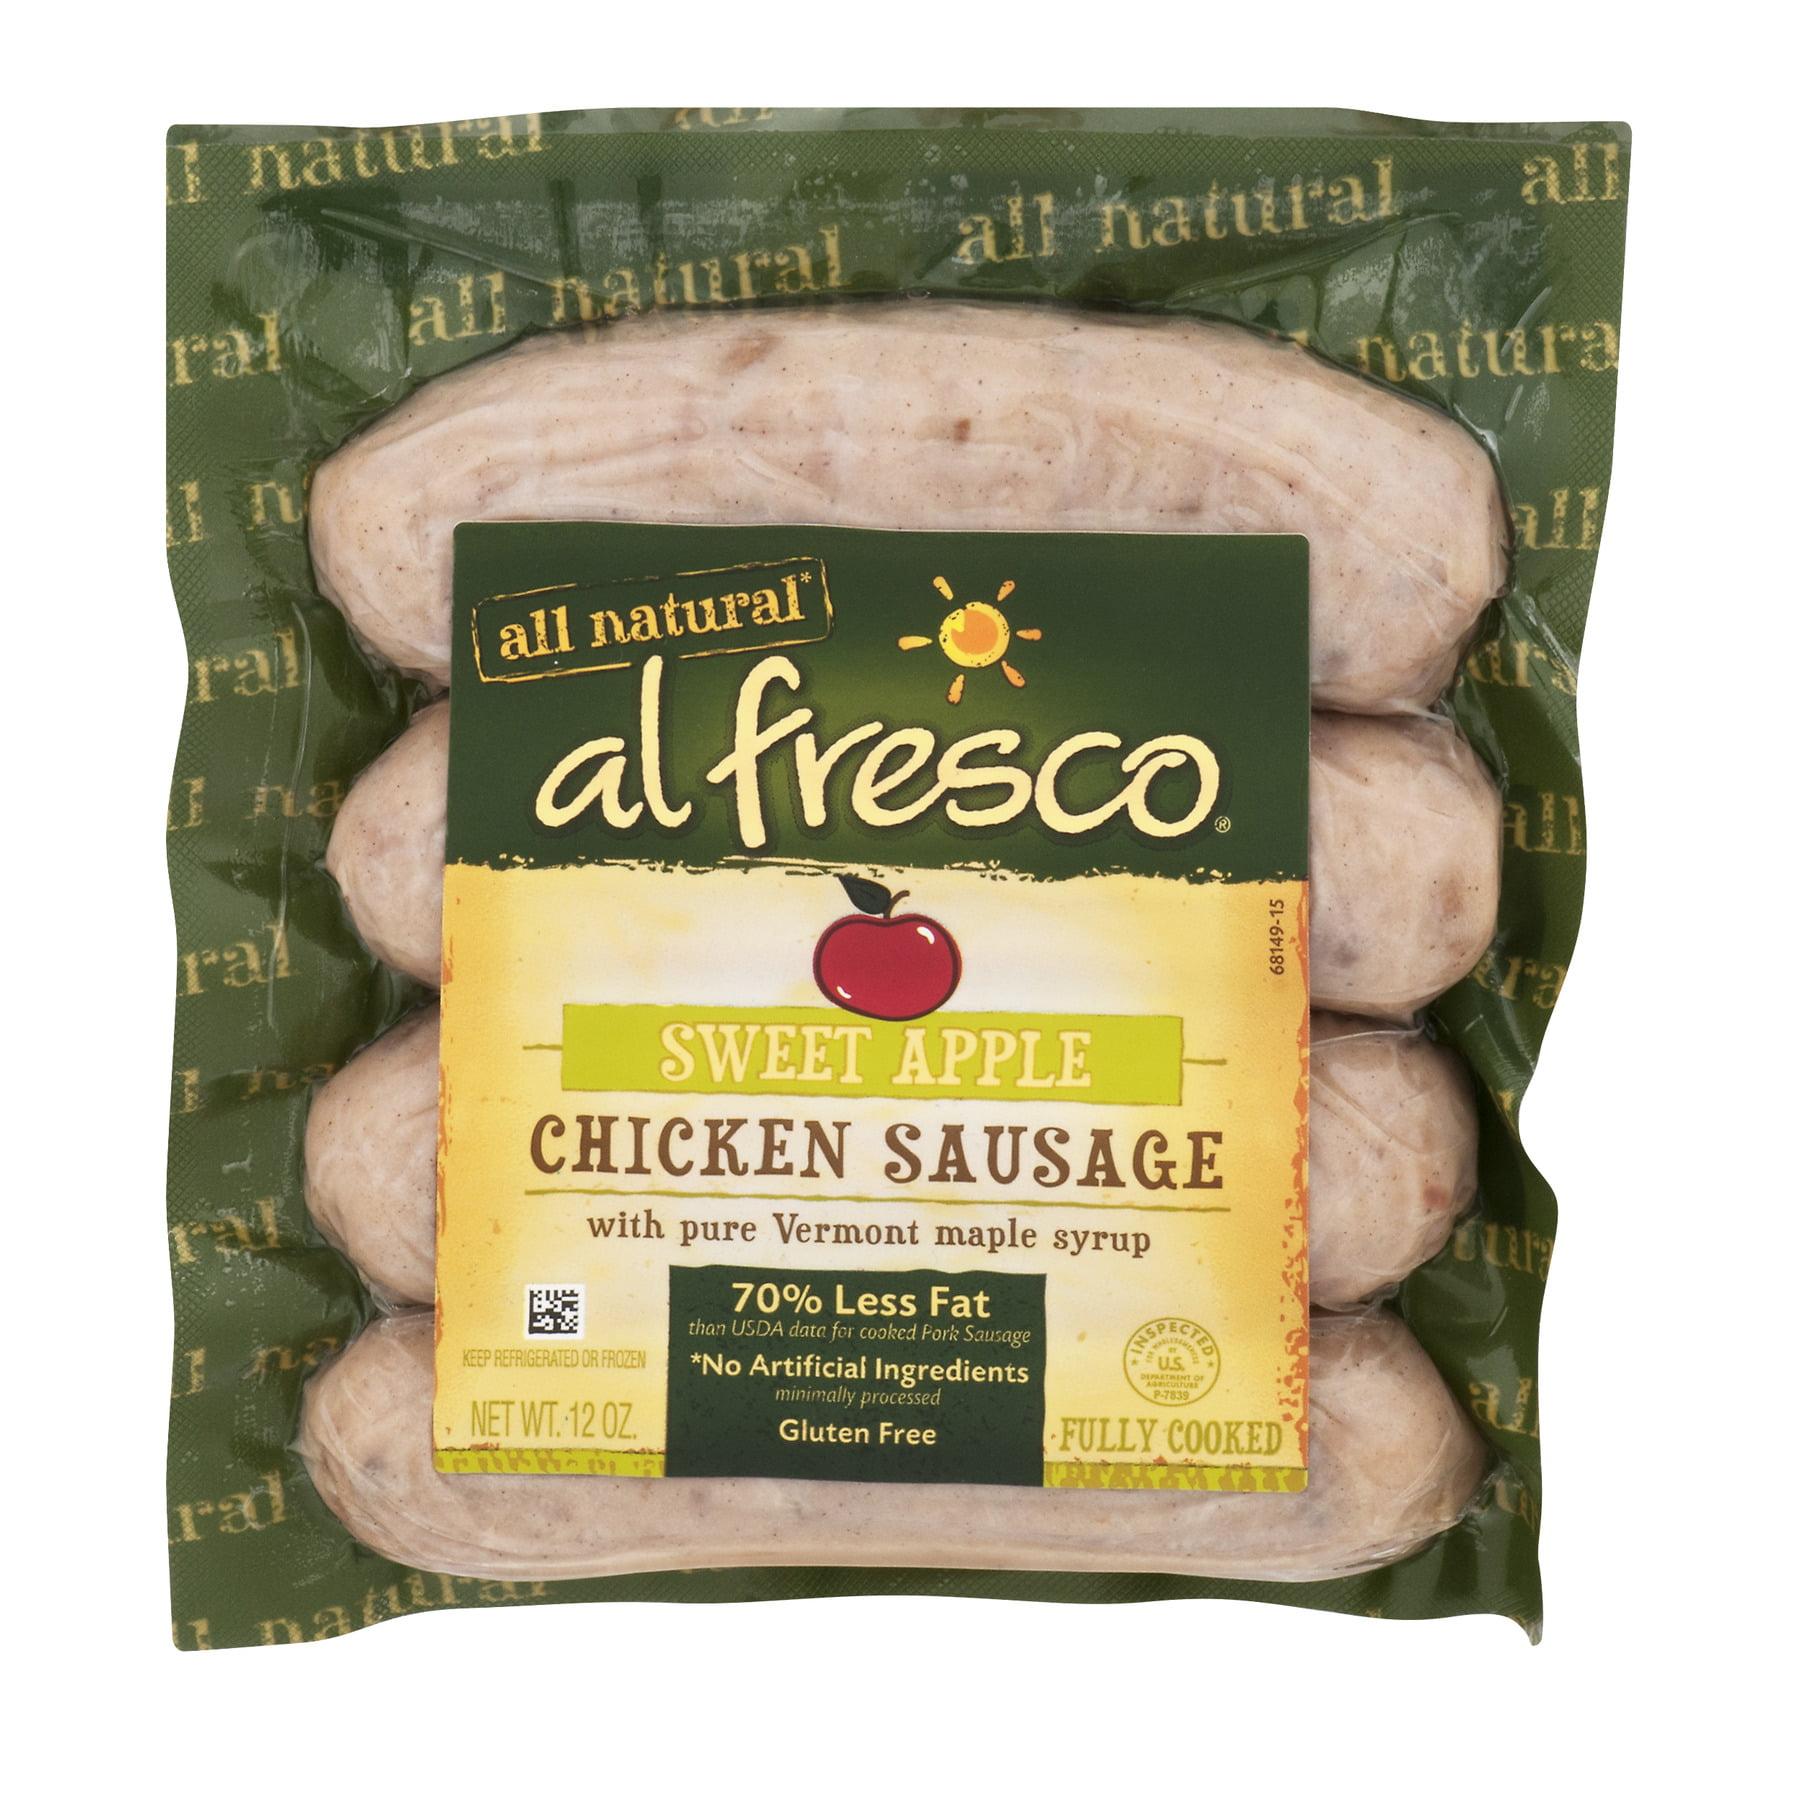 Al Fresco Sweet Apple Chicken Sausage, 12 oz